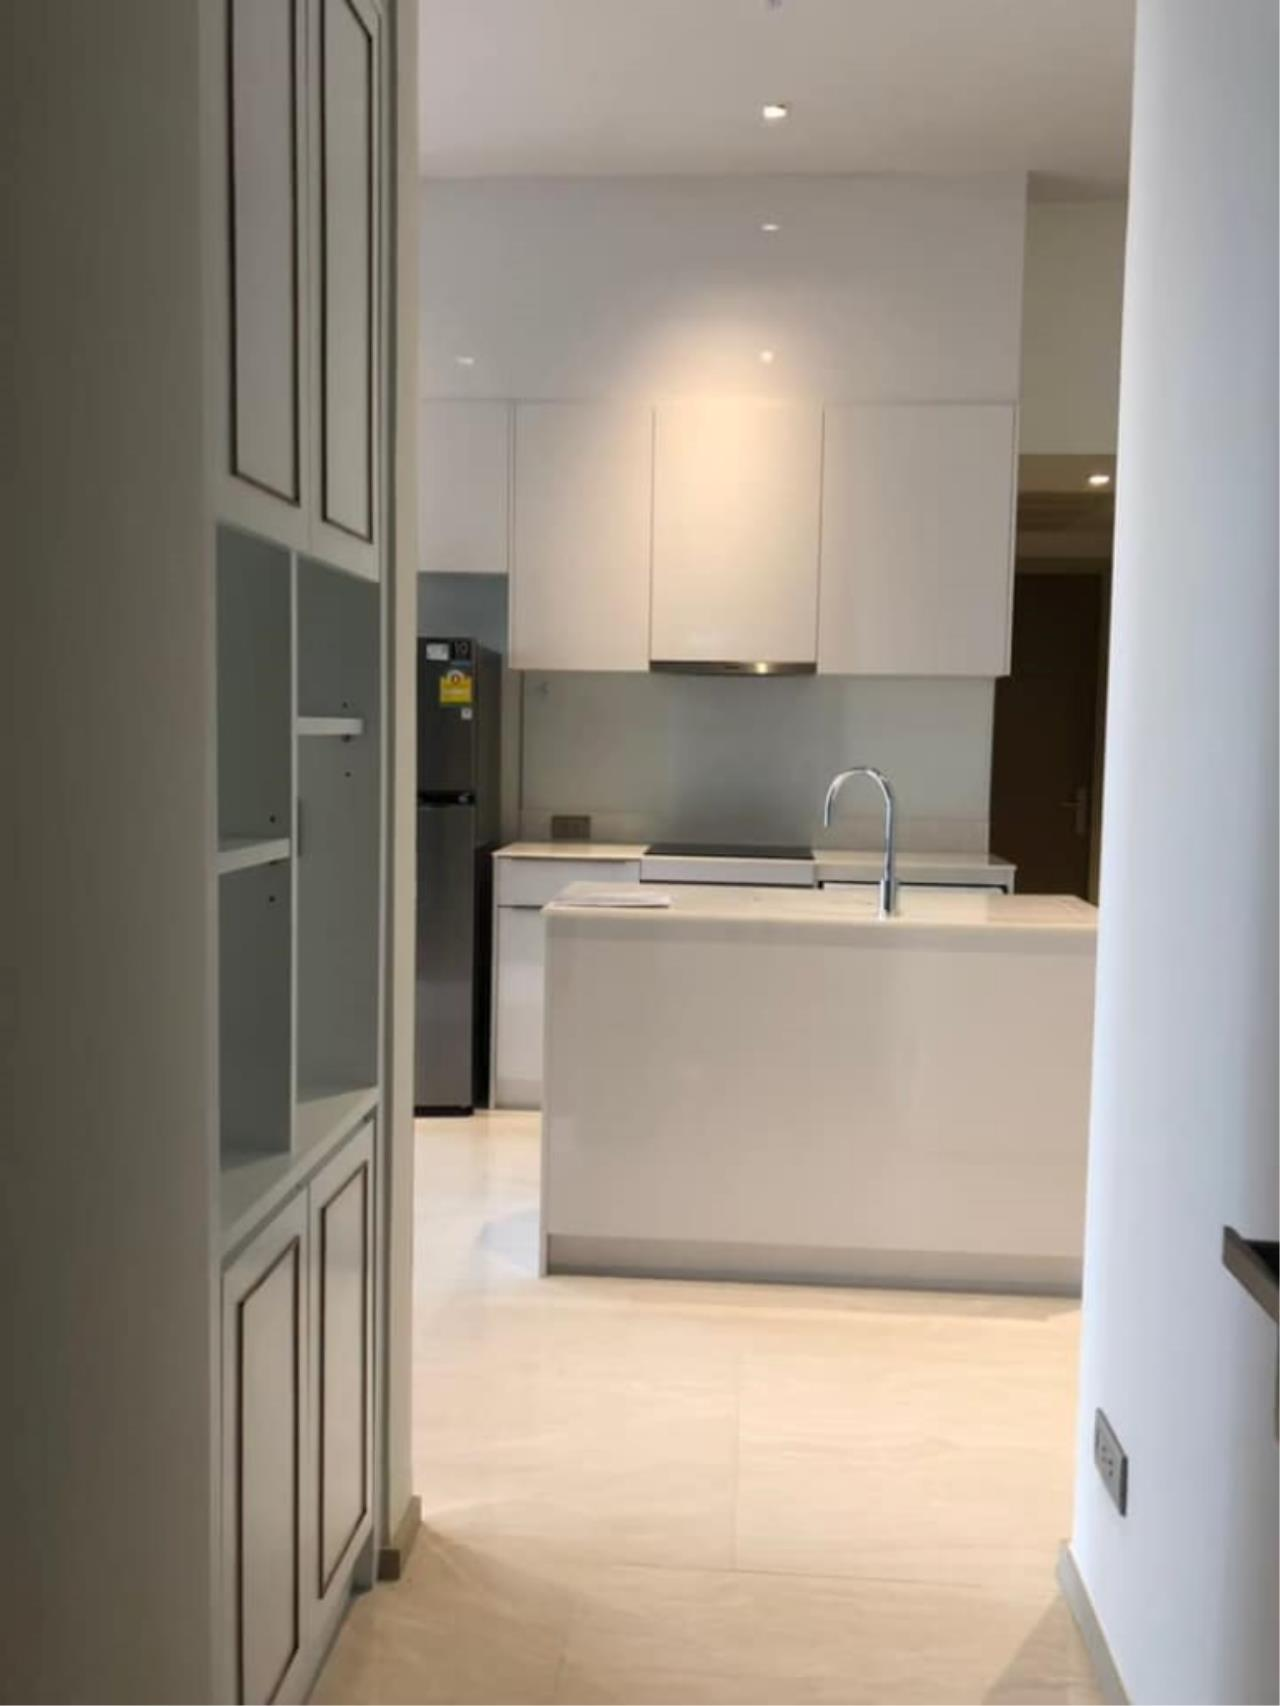 Century21 Skylux Agency's Ashton Silom / Condo For Rent / 2 Bedroom / 86 SQM / BTS Chong Nonsi / Bangkok 5